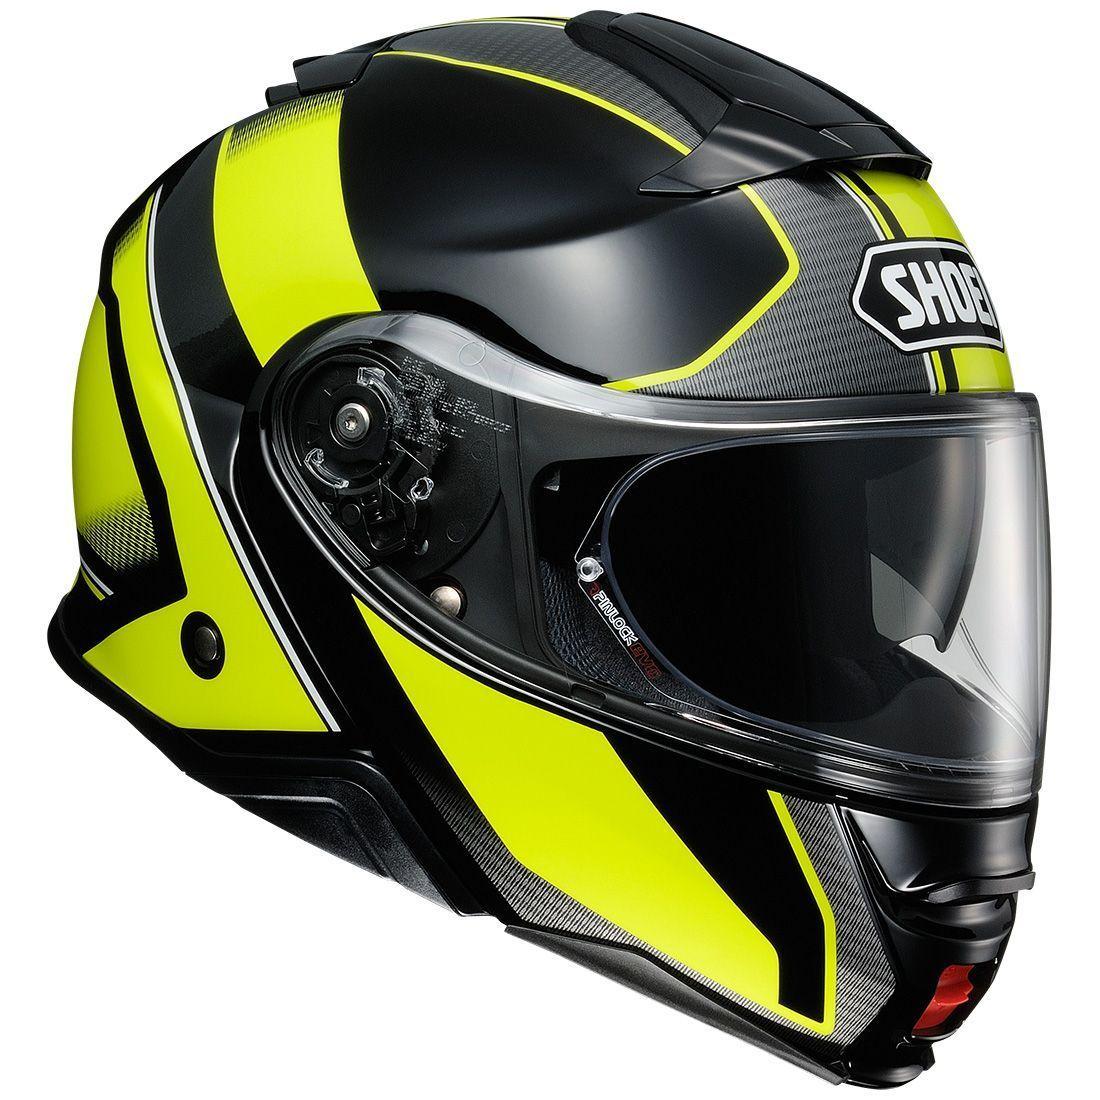 Capacete Shoei Neotec 2 Excursion TC-3 Escamoteável  - Nova Centro Boutique Roupas para Motociclistas